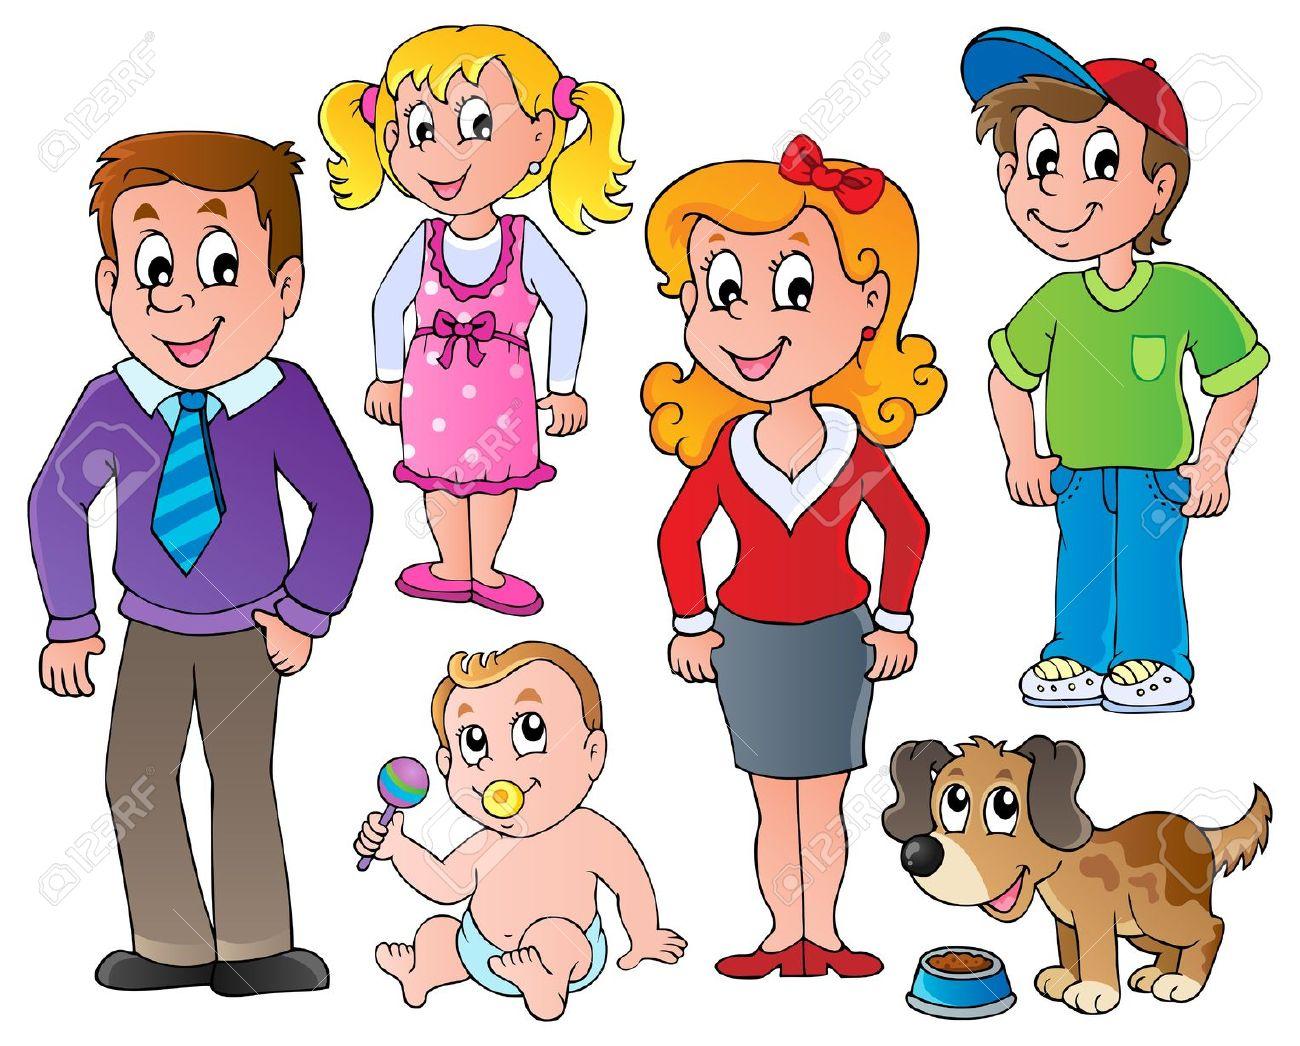 Family Picture Clipart & Family Picture Clip Art Images.